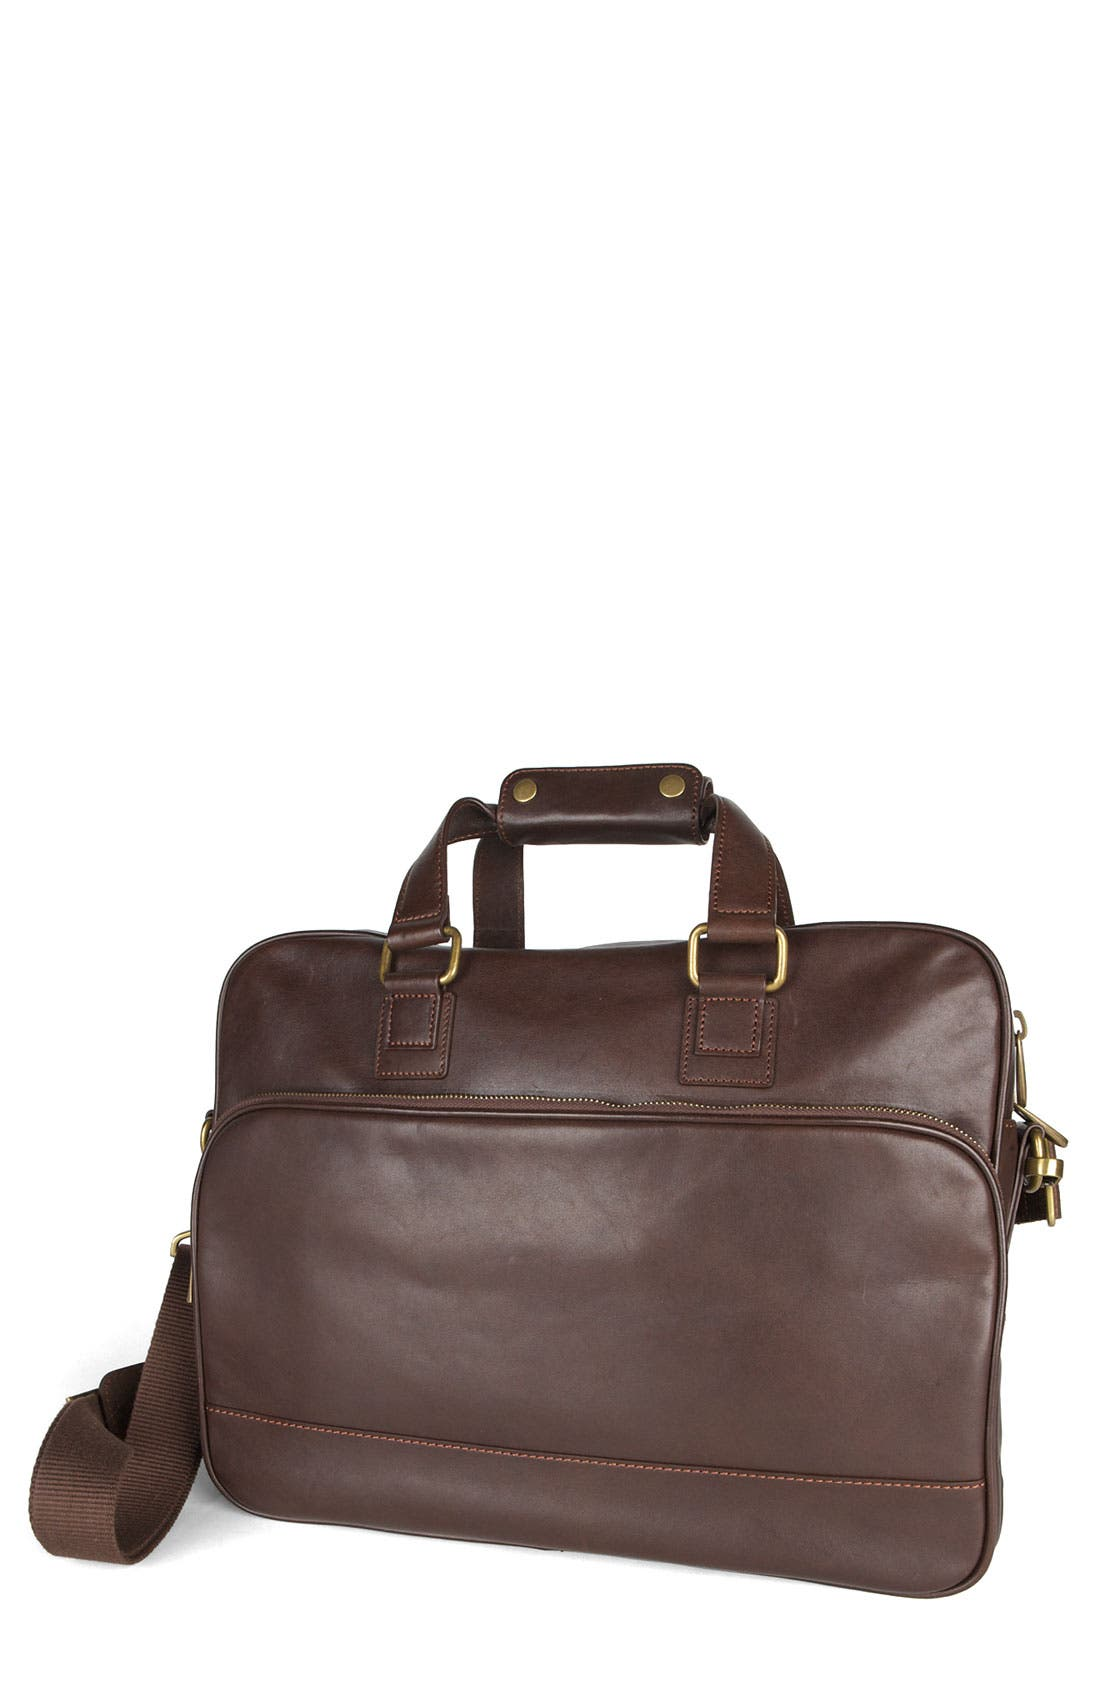 Main Image - Bosca Top Zip Leather Briefcase